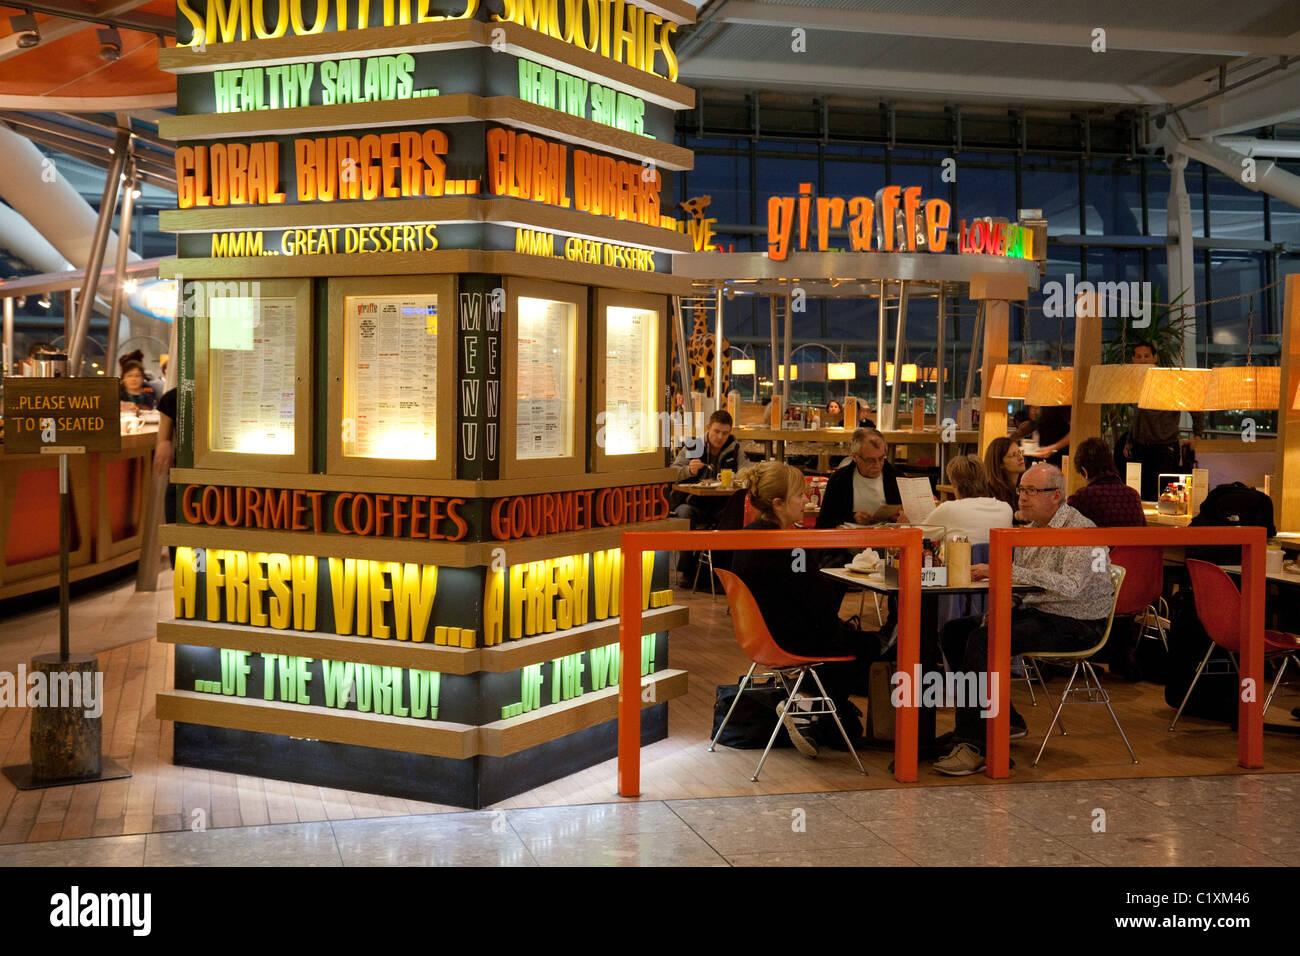 The Giraffe restaurant/cafe in terminal 5, heathrow airport London UK - Stock Image